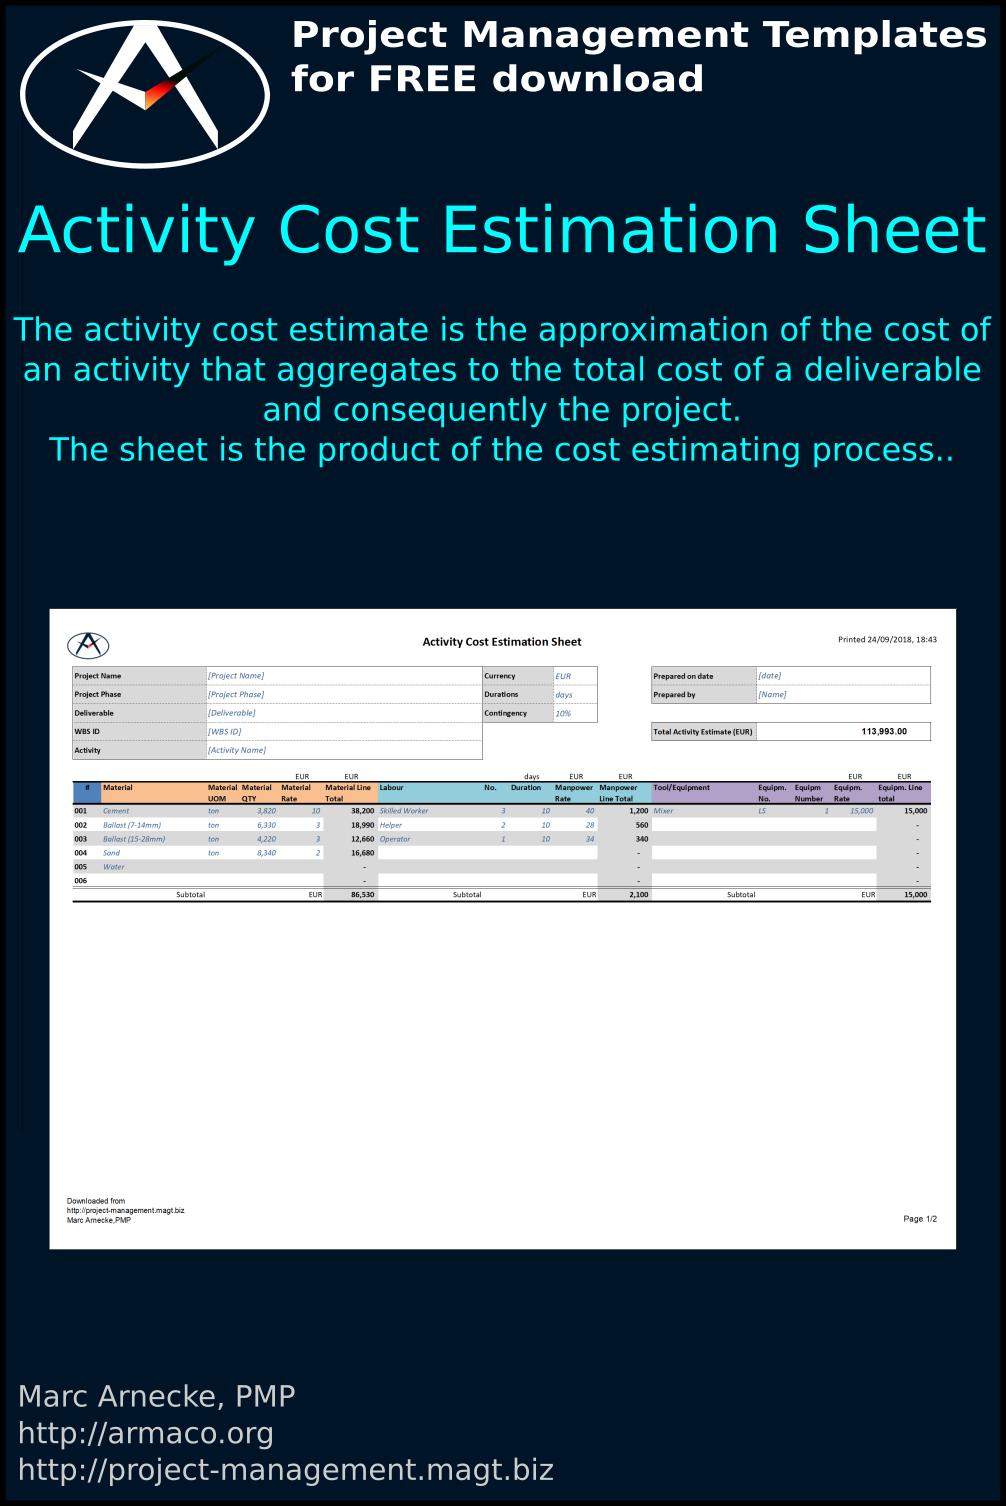 Download Activity Cost Estimation Sheet